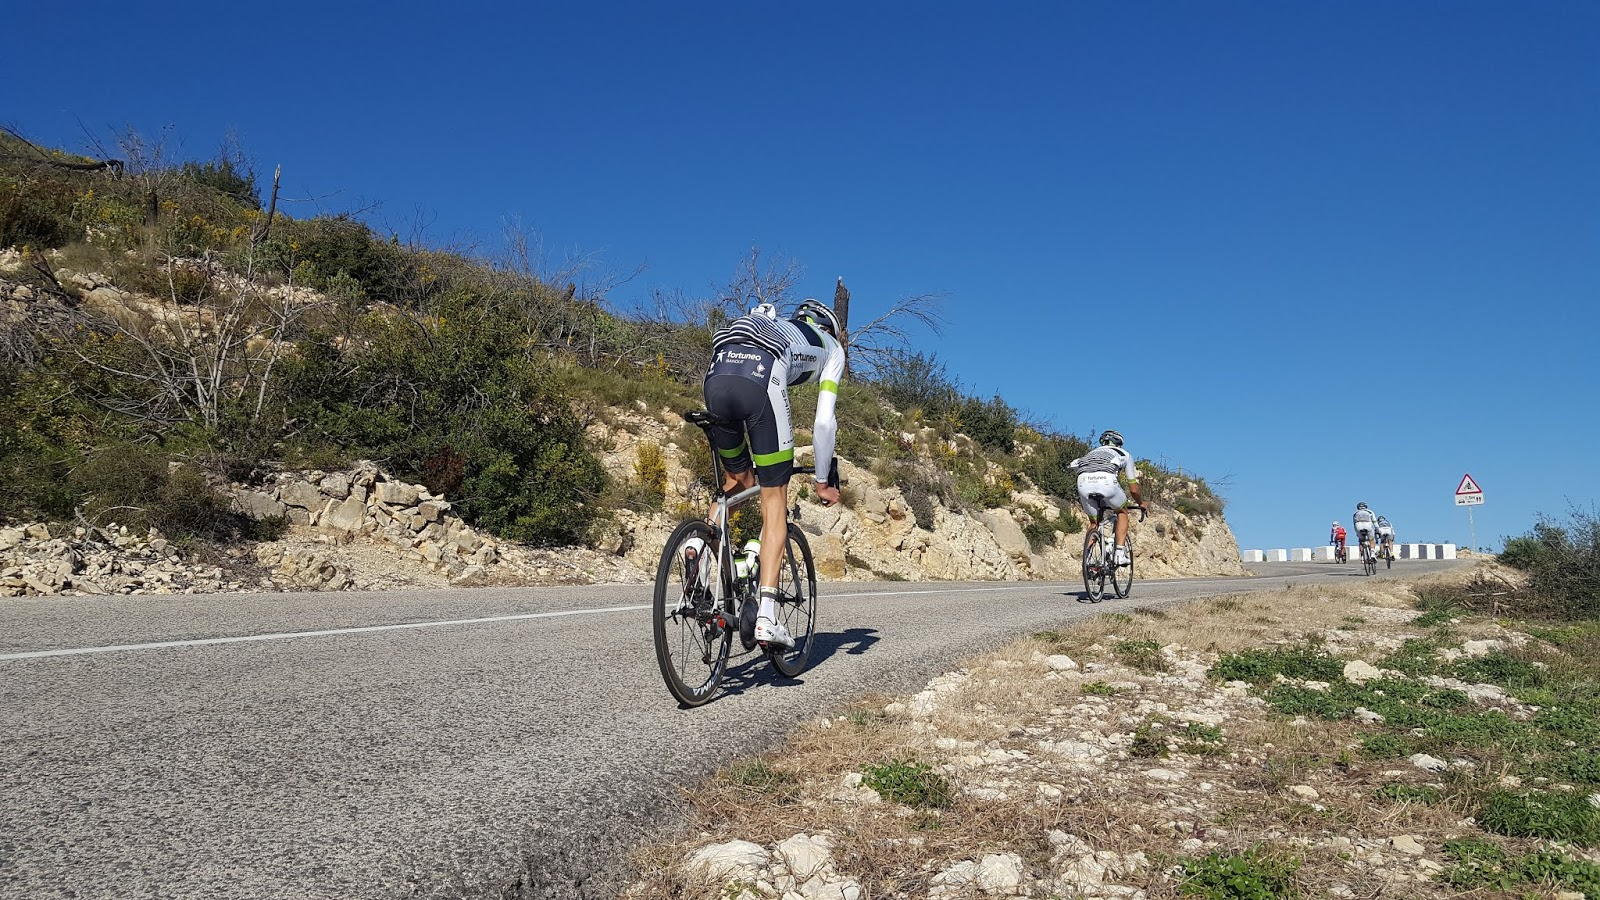 Final ramp to the summit of Puerto de Vall de Ebo